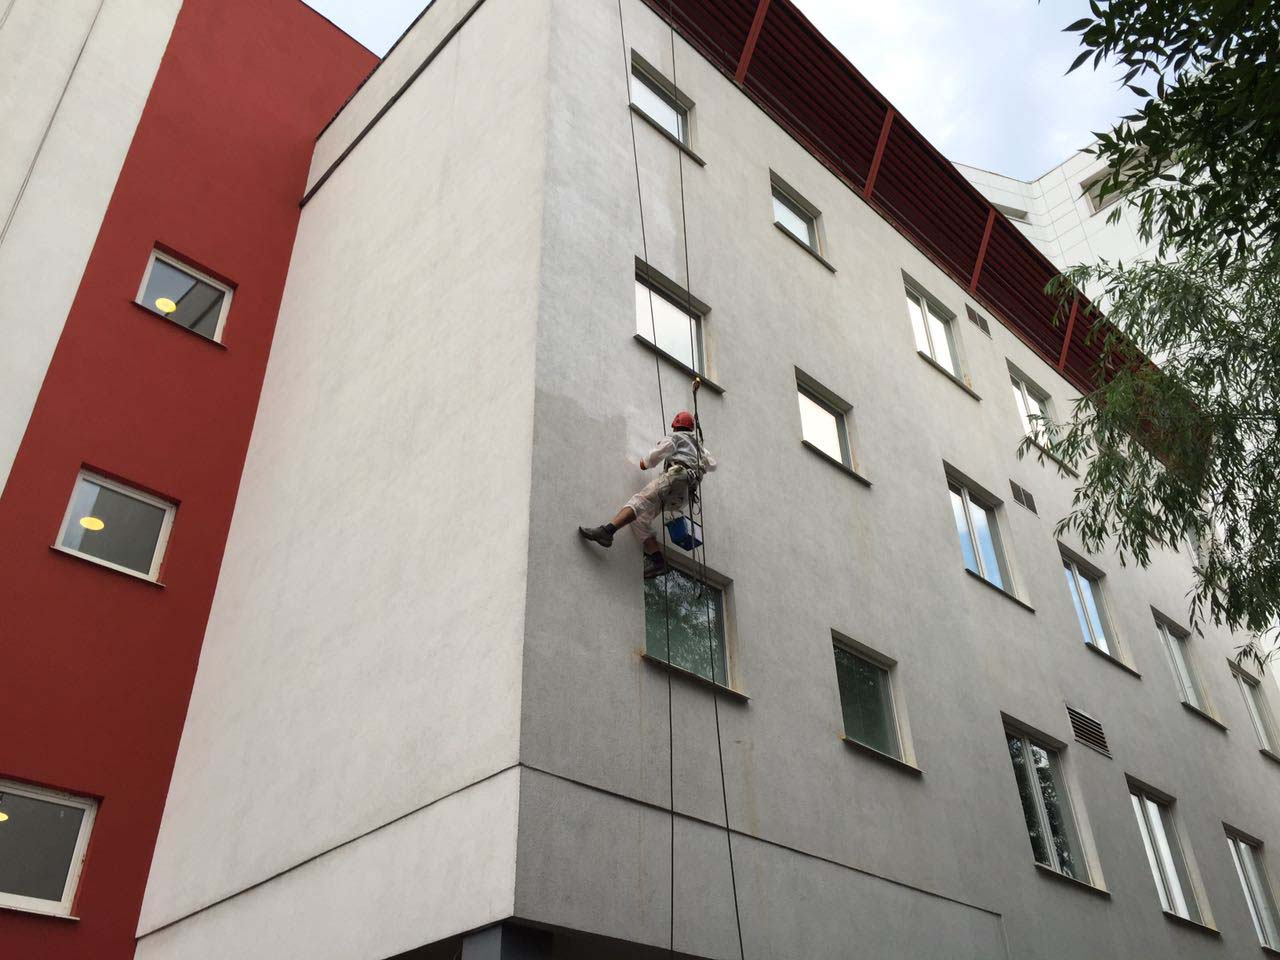 фасадная покраска альпинистами